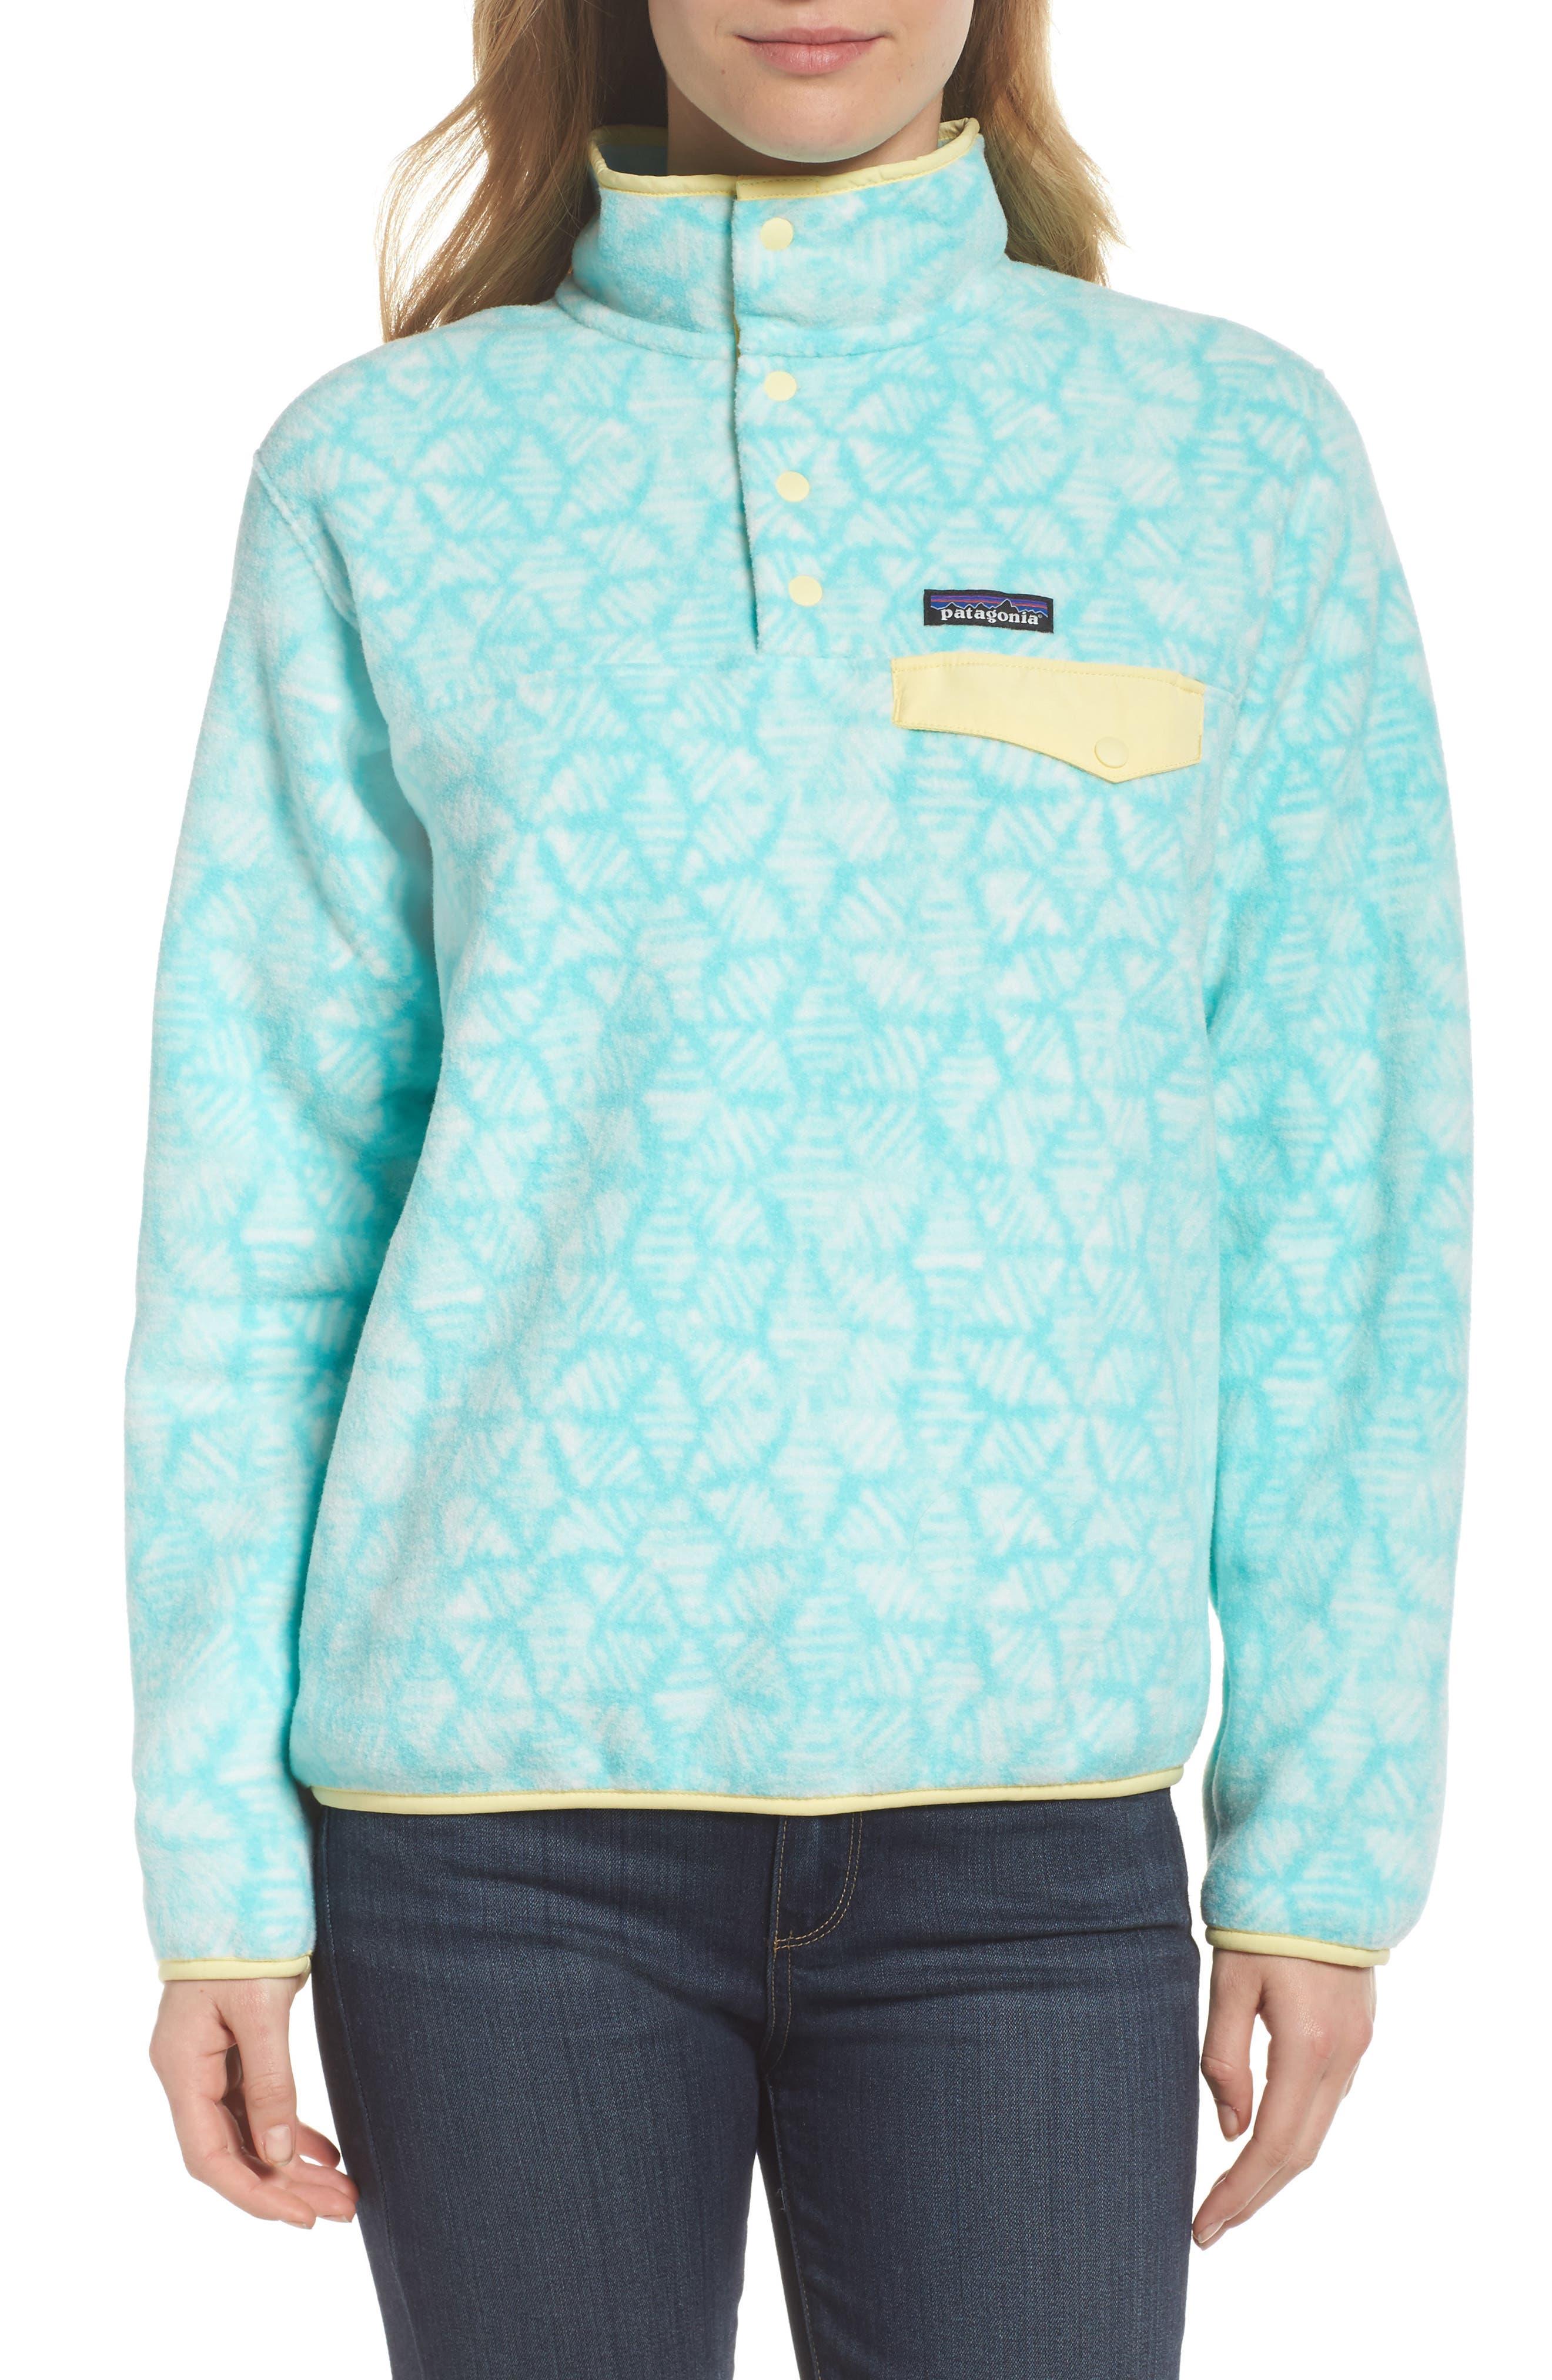 Synchilla Snap-T<sup>®</sup> Fleece Pullover,                             Main thumbnail 1, color,                             Batik Hex Big/ Bend Blue